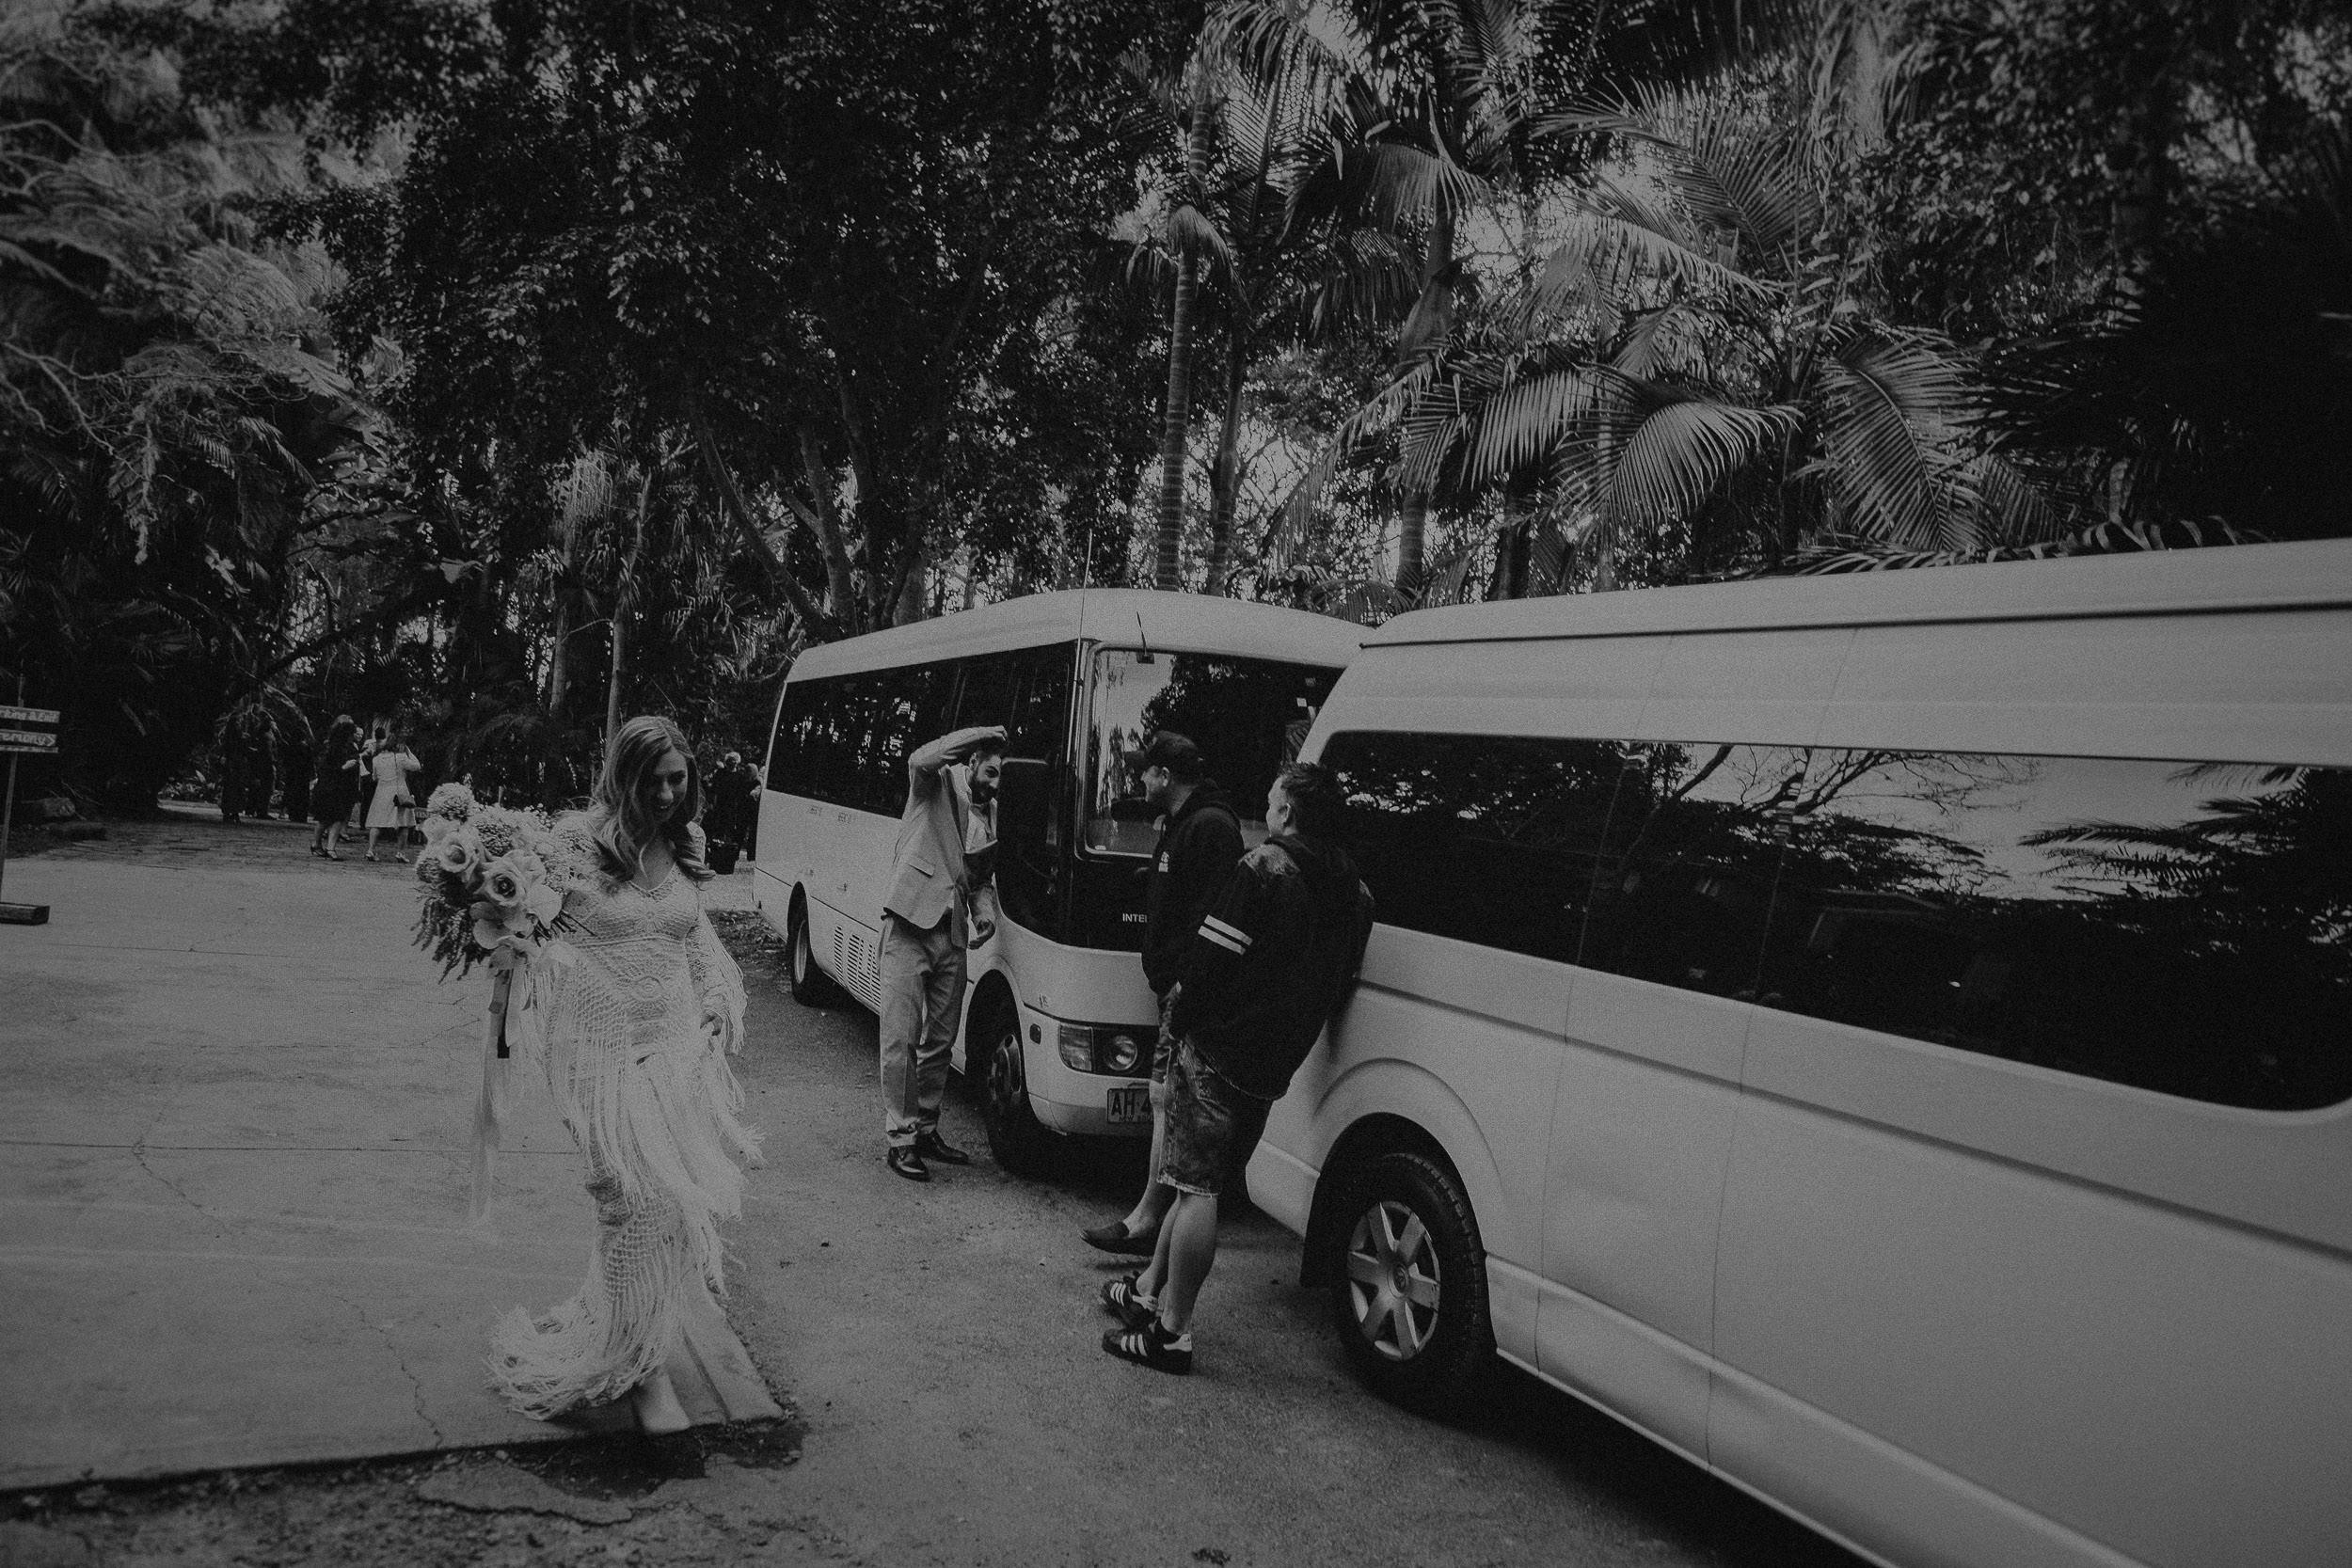 S&A Elopement - Kings & Thieves - Shred 'Til Dead - Central Coast Beach Forest Wedding - 303.jpg